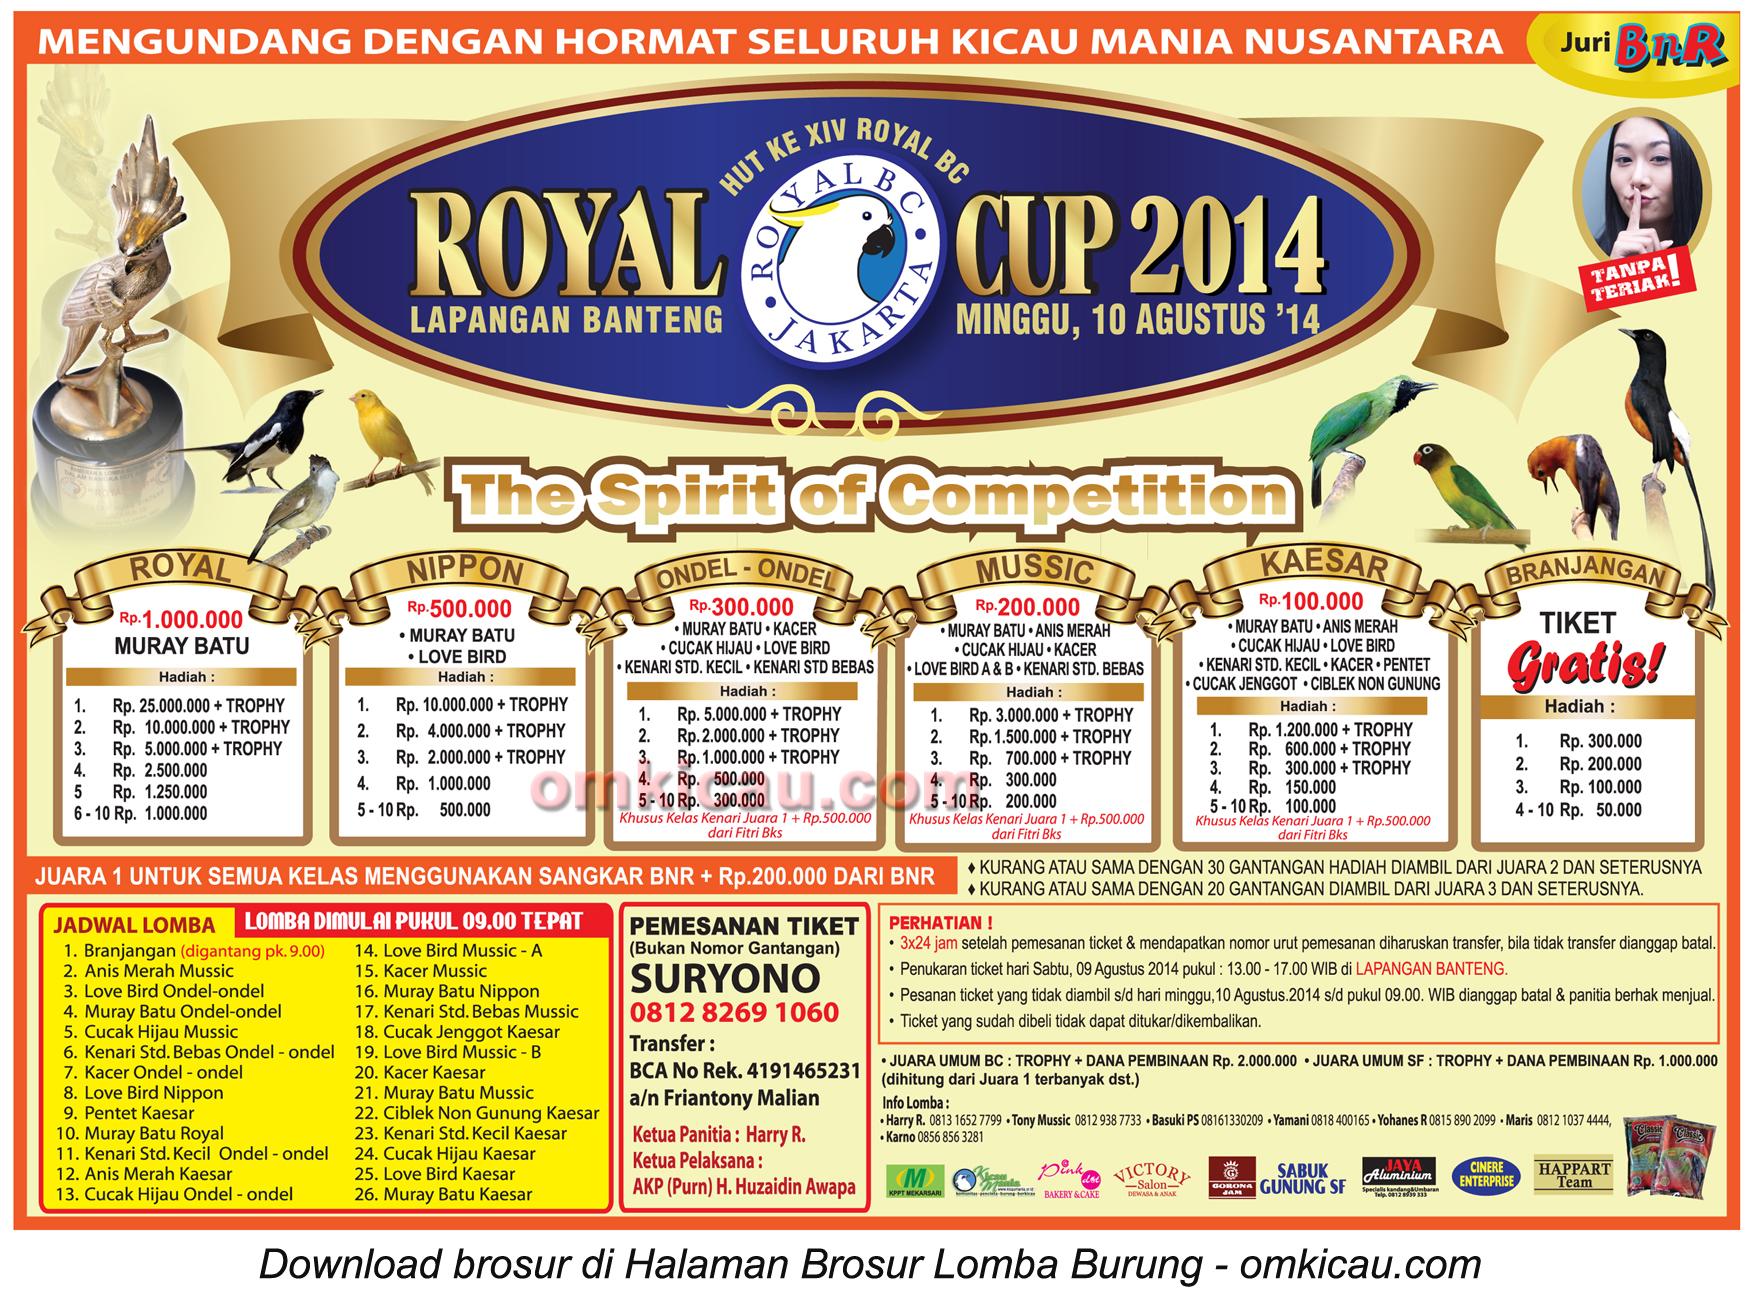 Brosur Lomba Burung Berkicau Royal Cup, Jakarta, 10 Agustus 2014